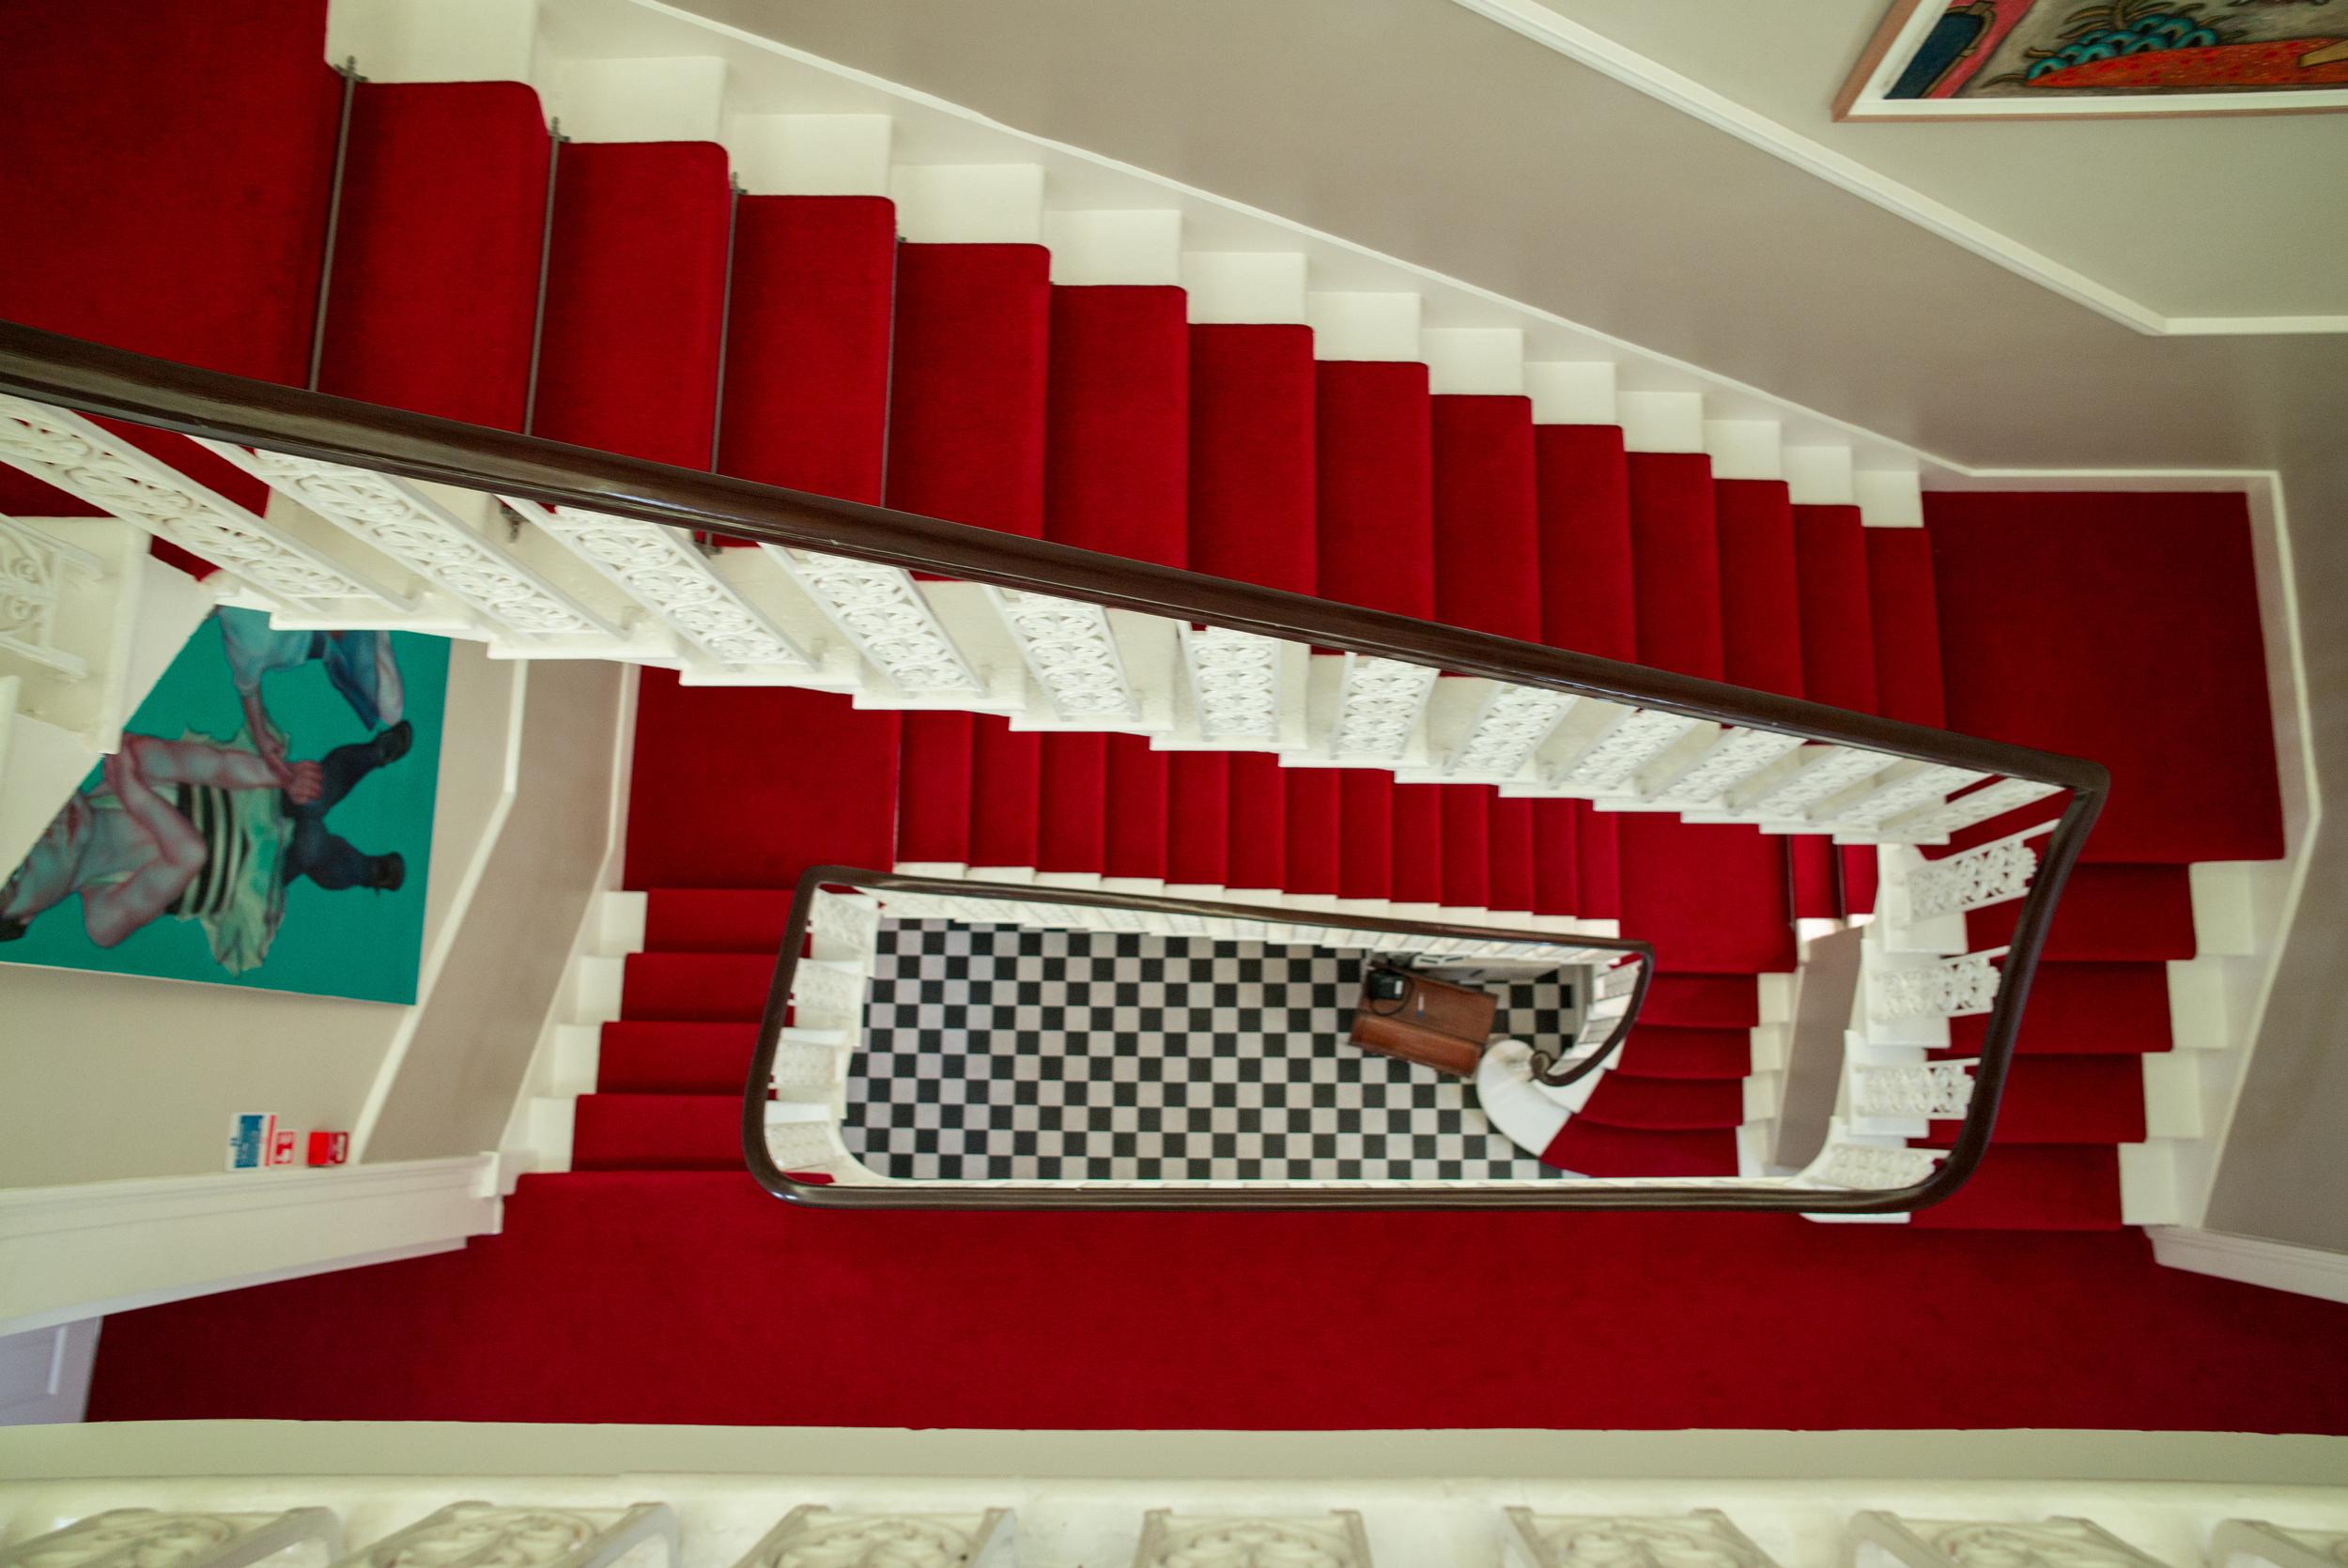 Art filled Stairwell.